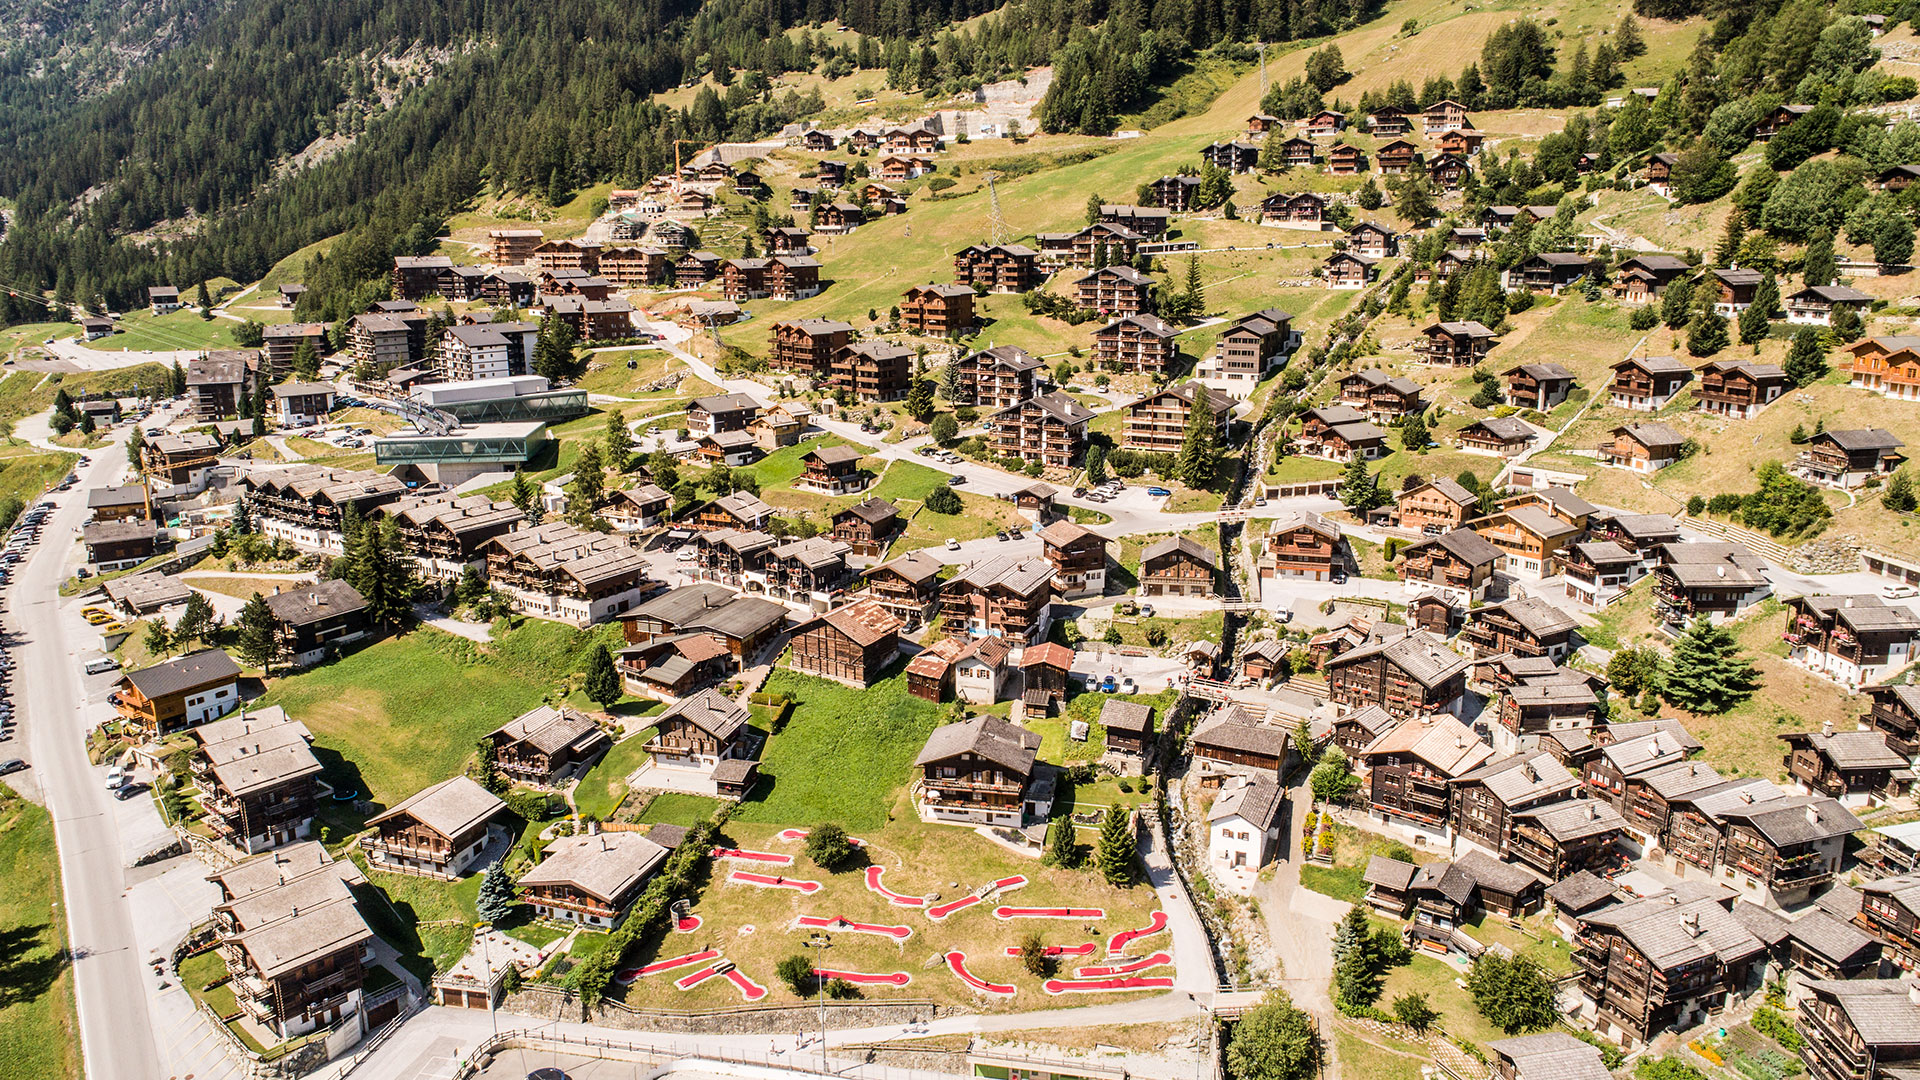 Chalet La Legende Chalet, Switzerland